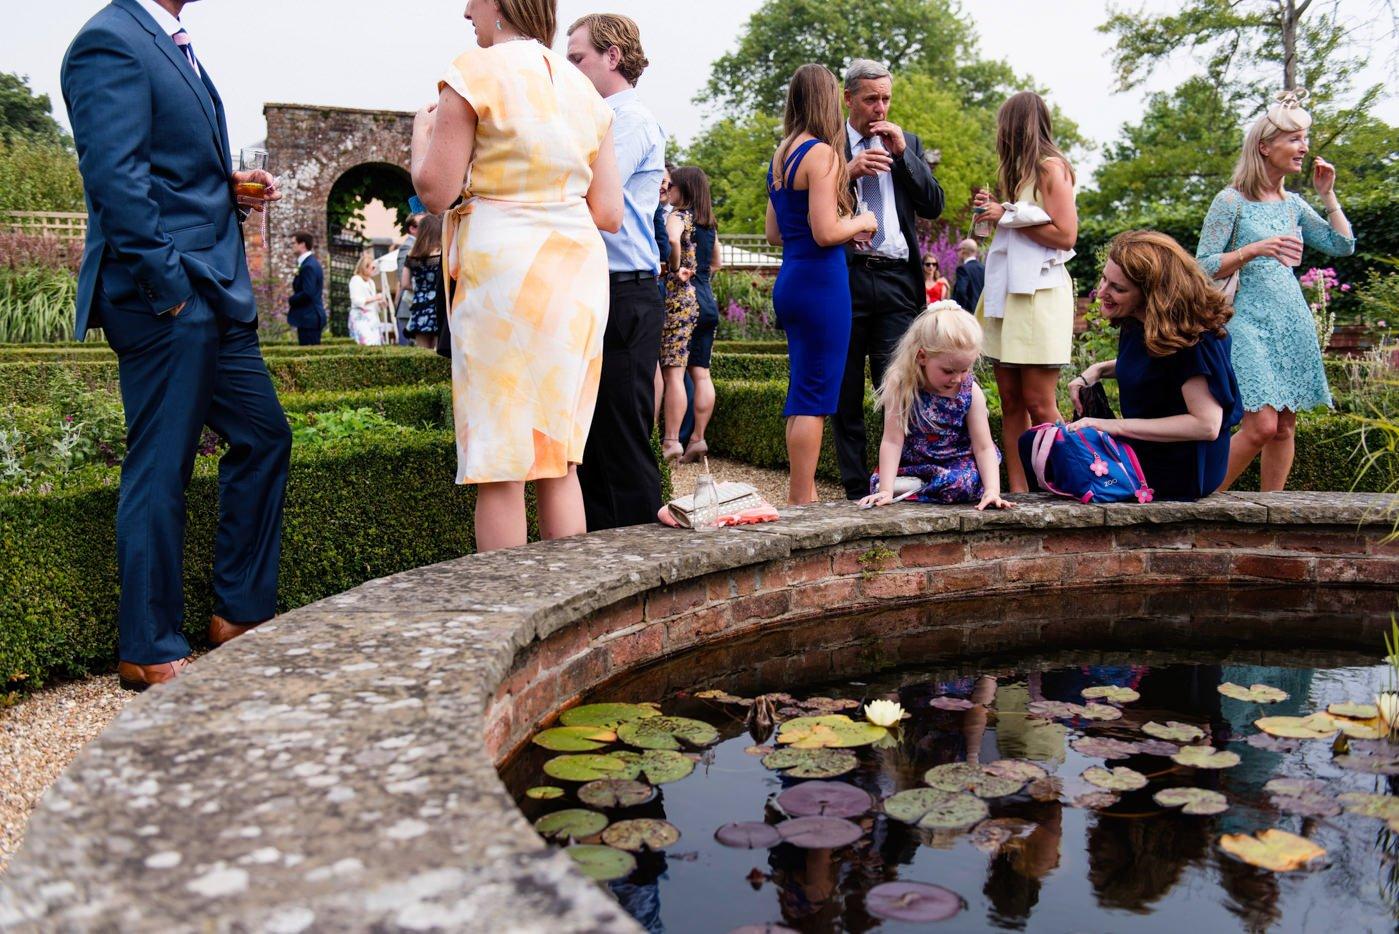 bignor-park-wedding-photography-robyn-and-tom-41